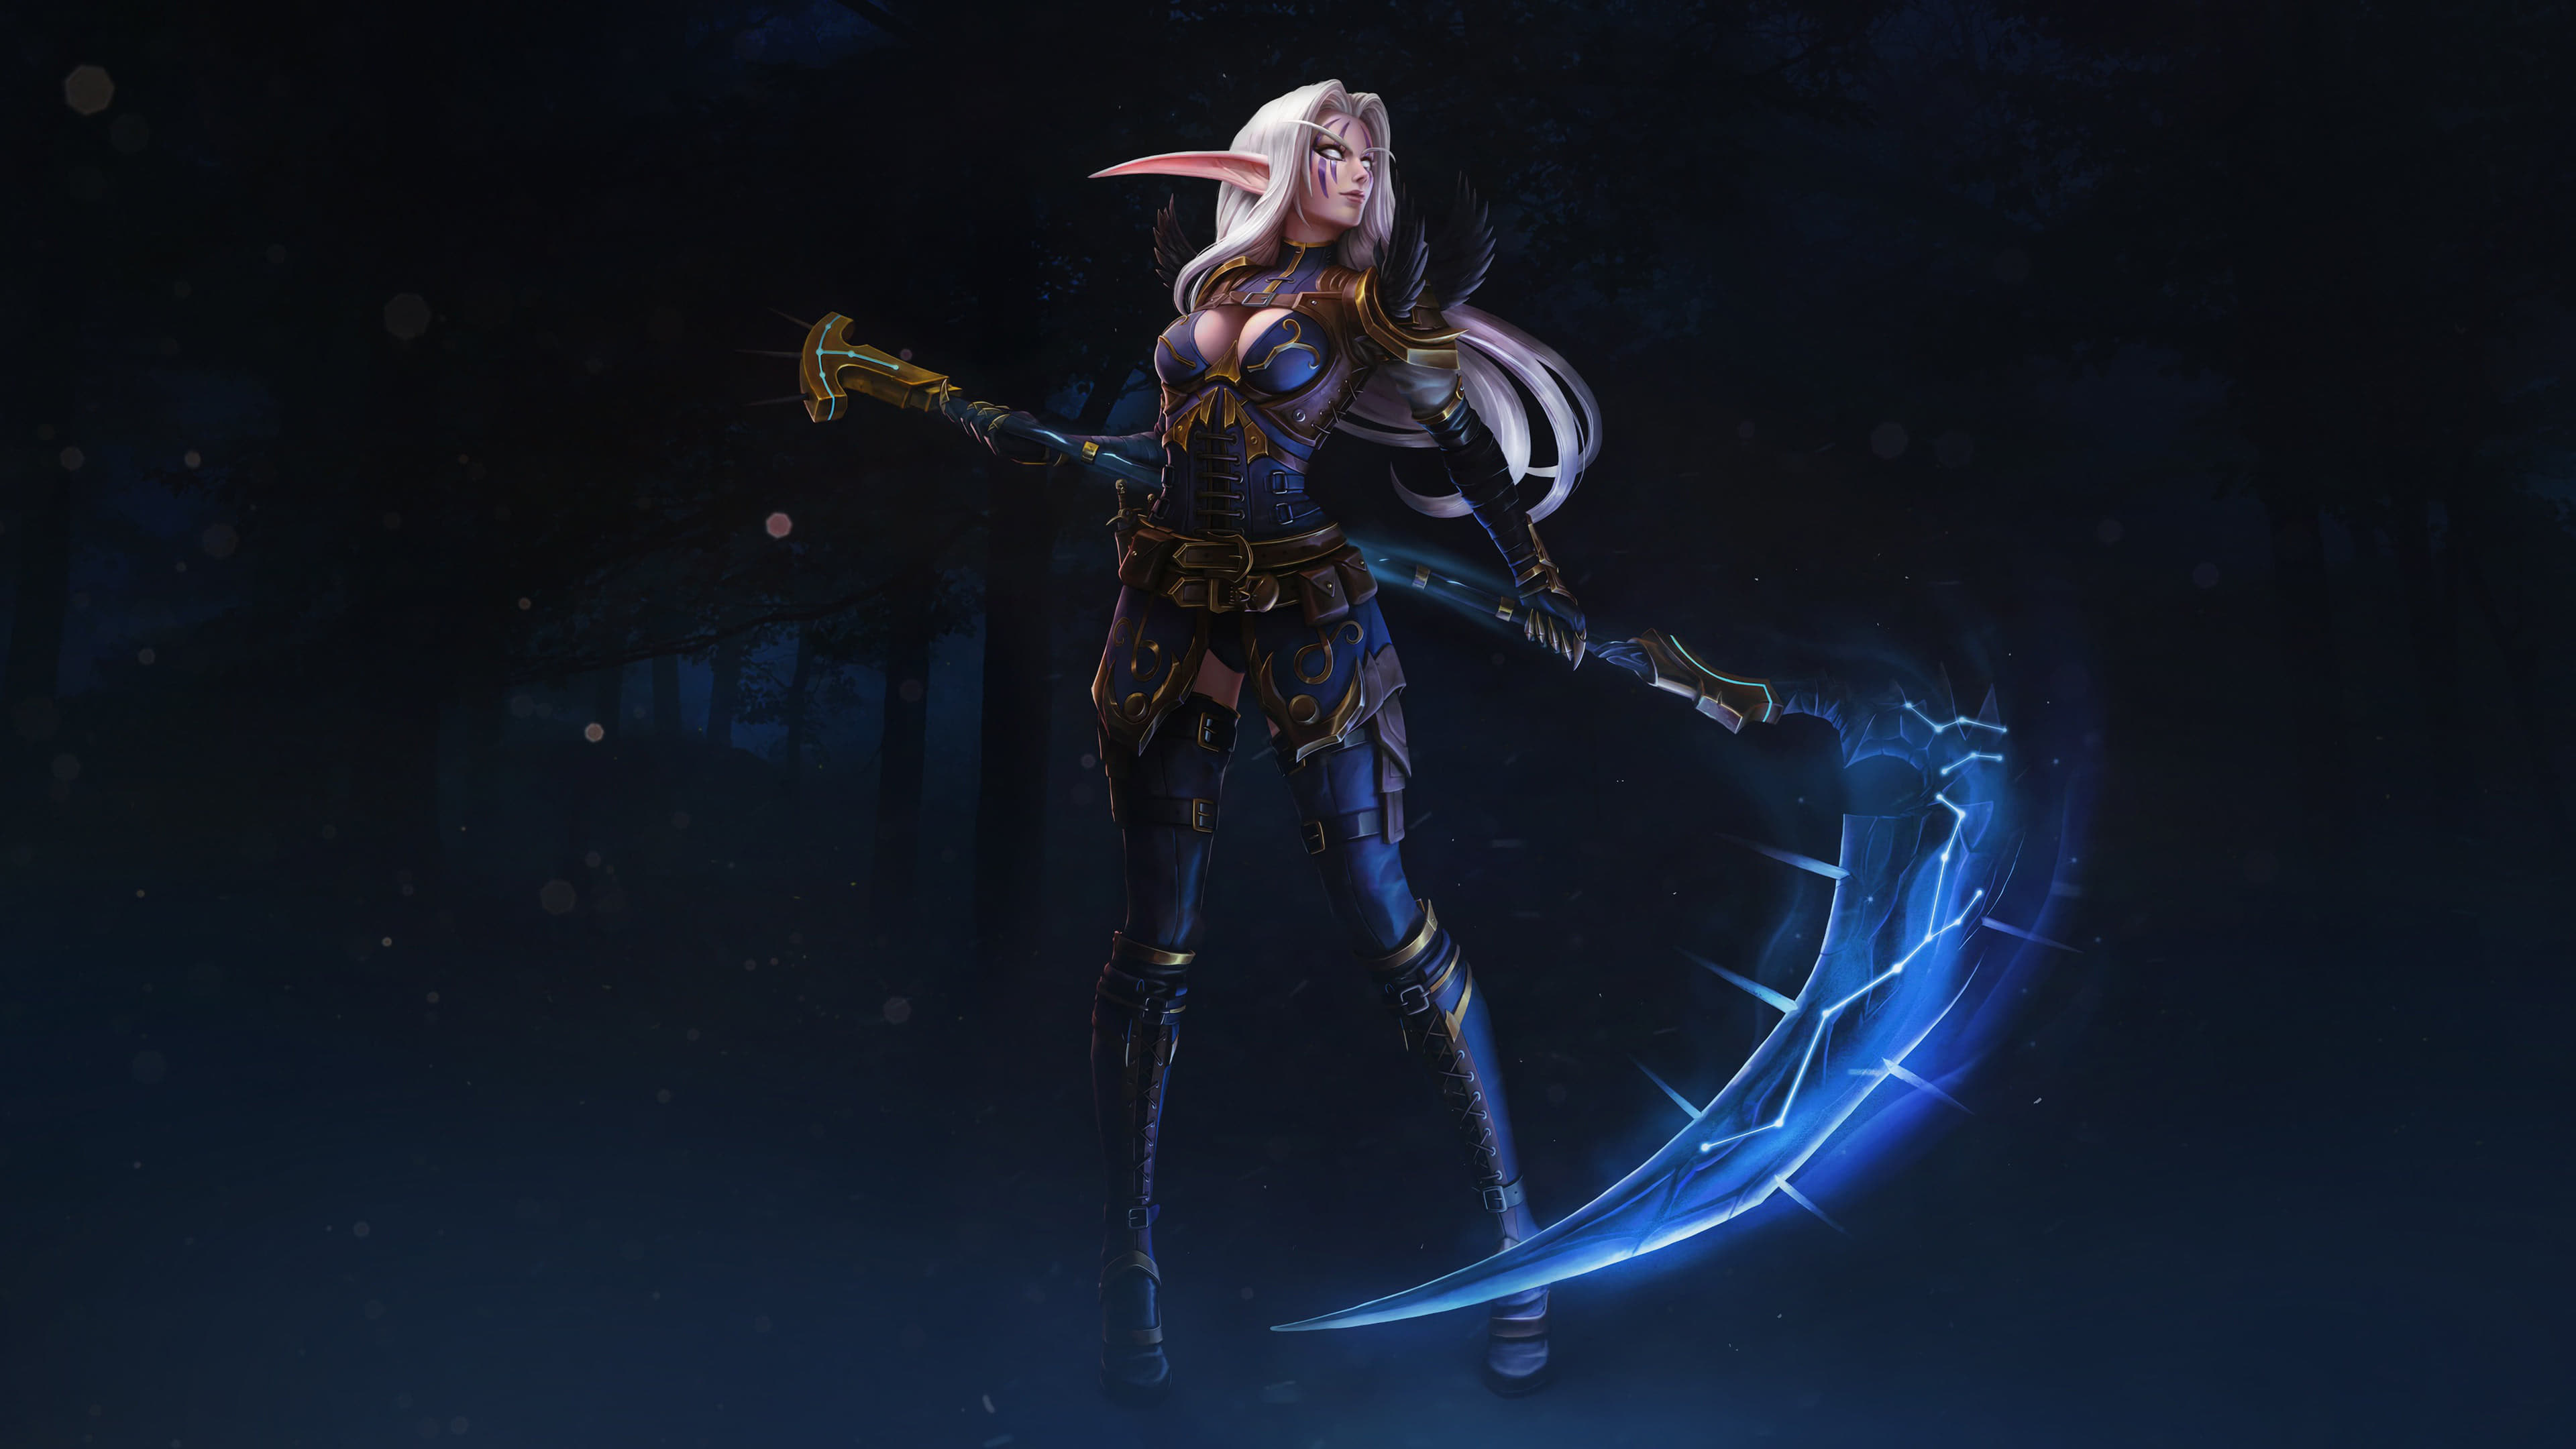 World Of Warcraft Night Elf Scythe Uhd 4k Wallpaper Pixelz